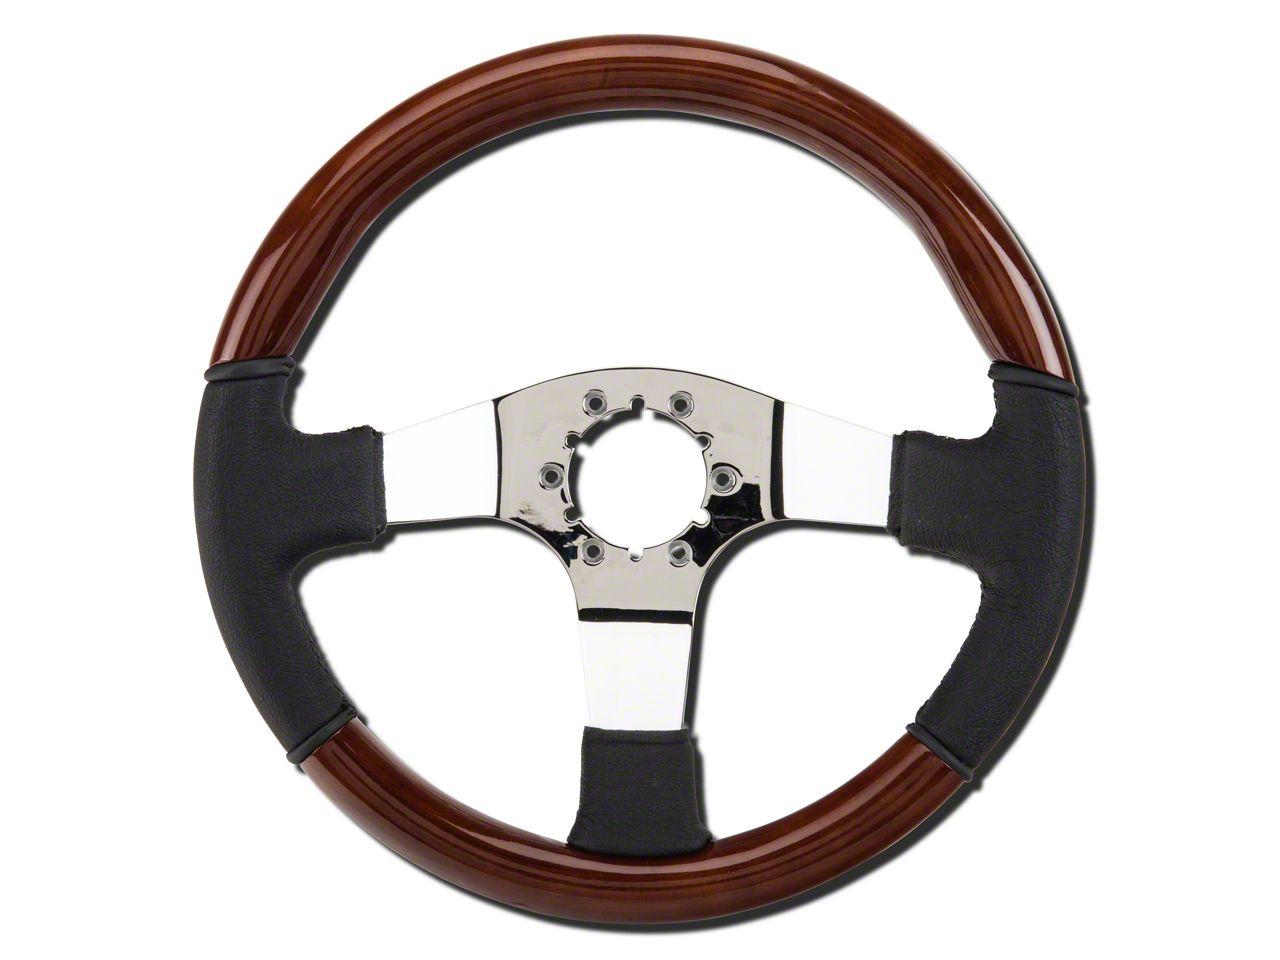 Alterum Wood & Leather Steering Wheel (79-04 All)